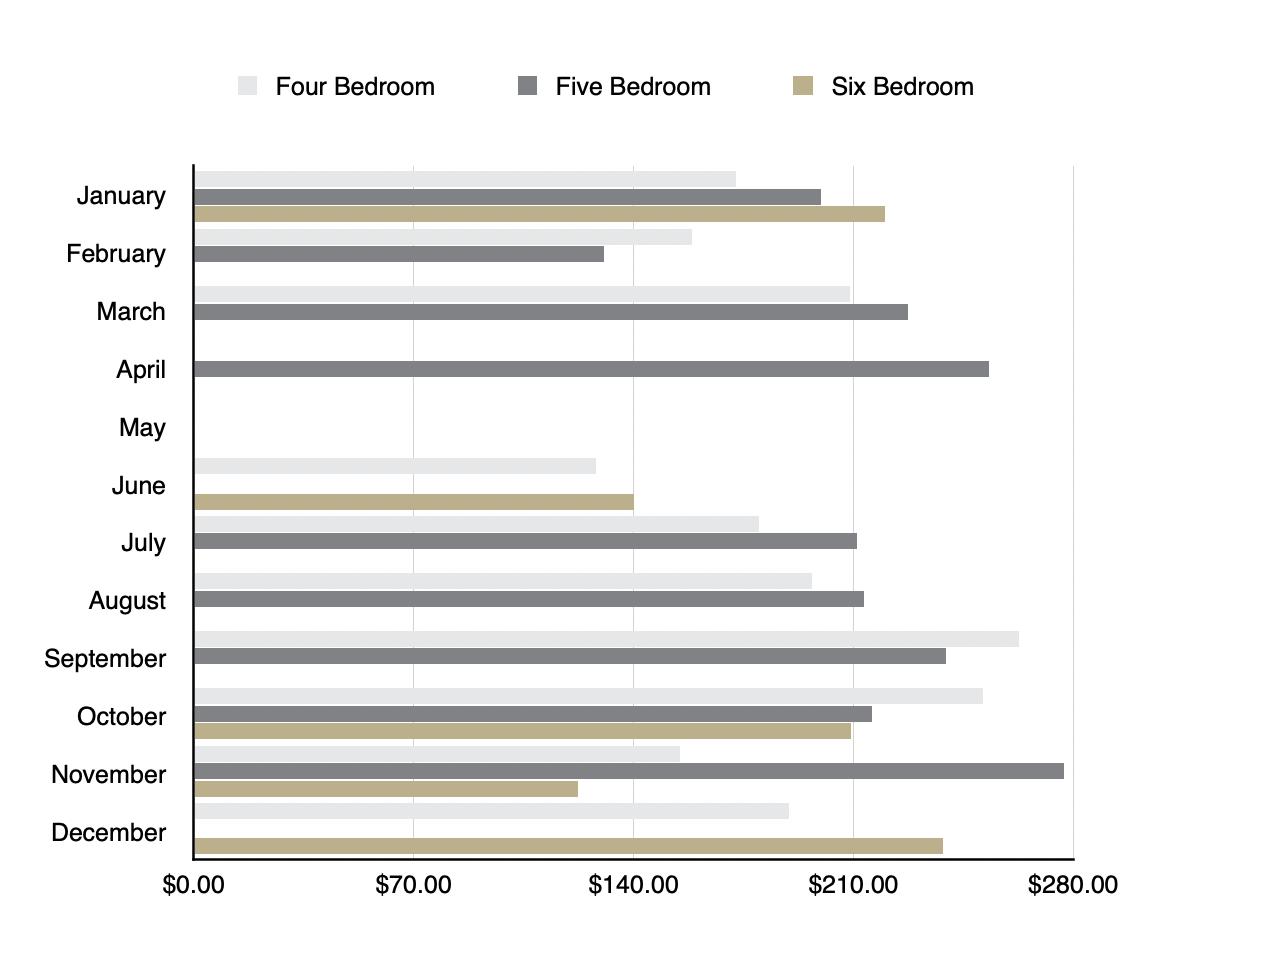 Pigeon Forge - Average Price Bedrooms 4-6